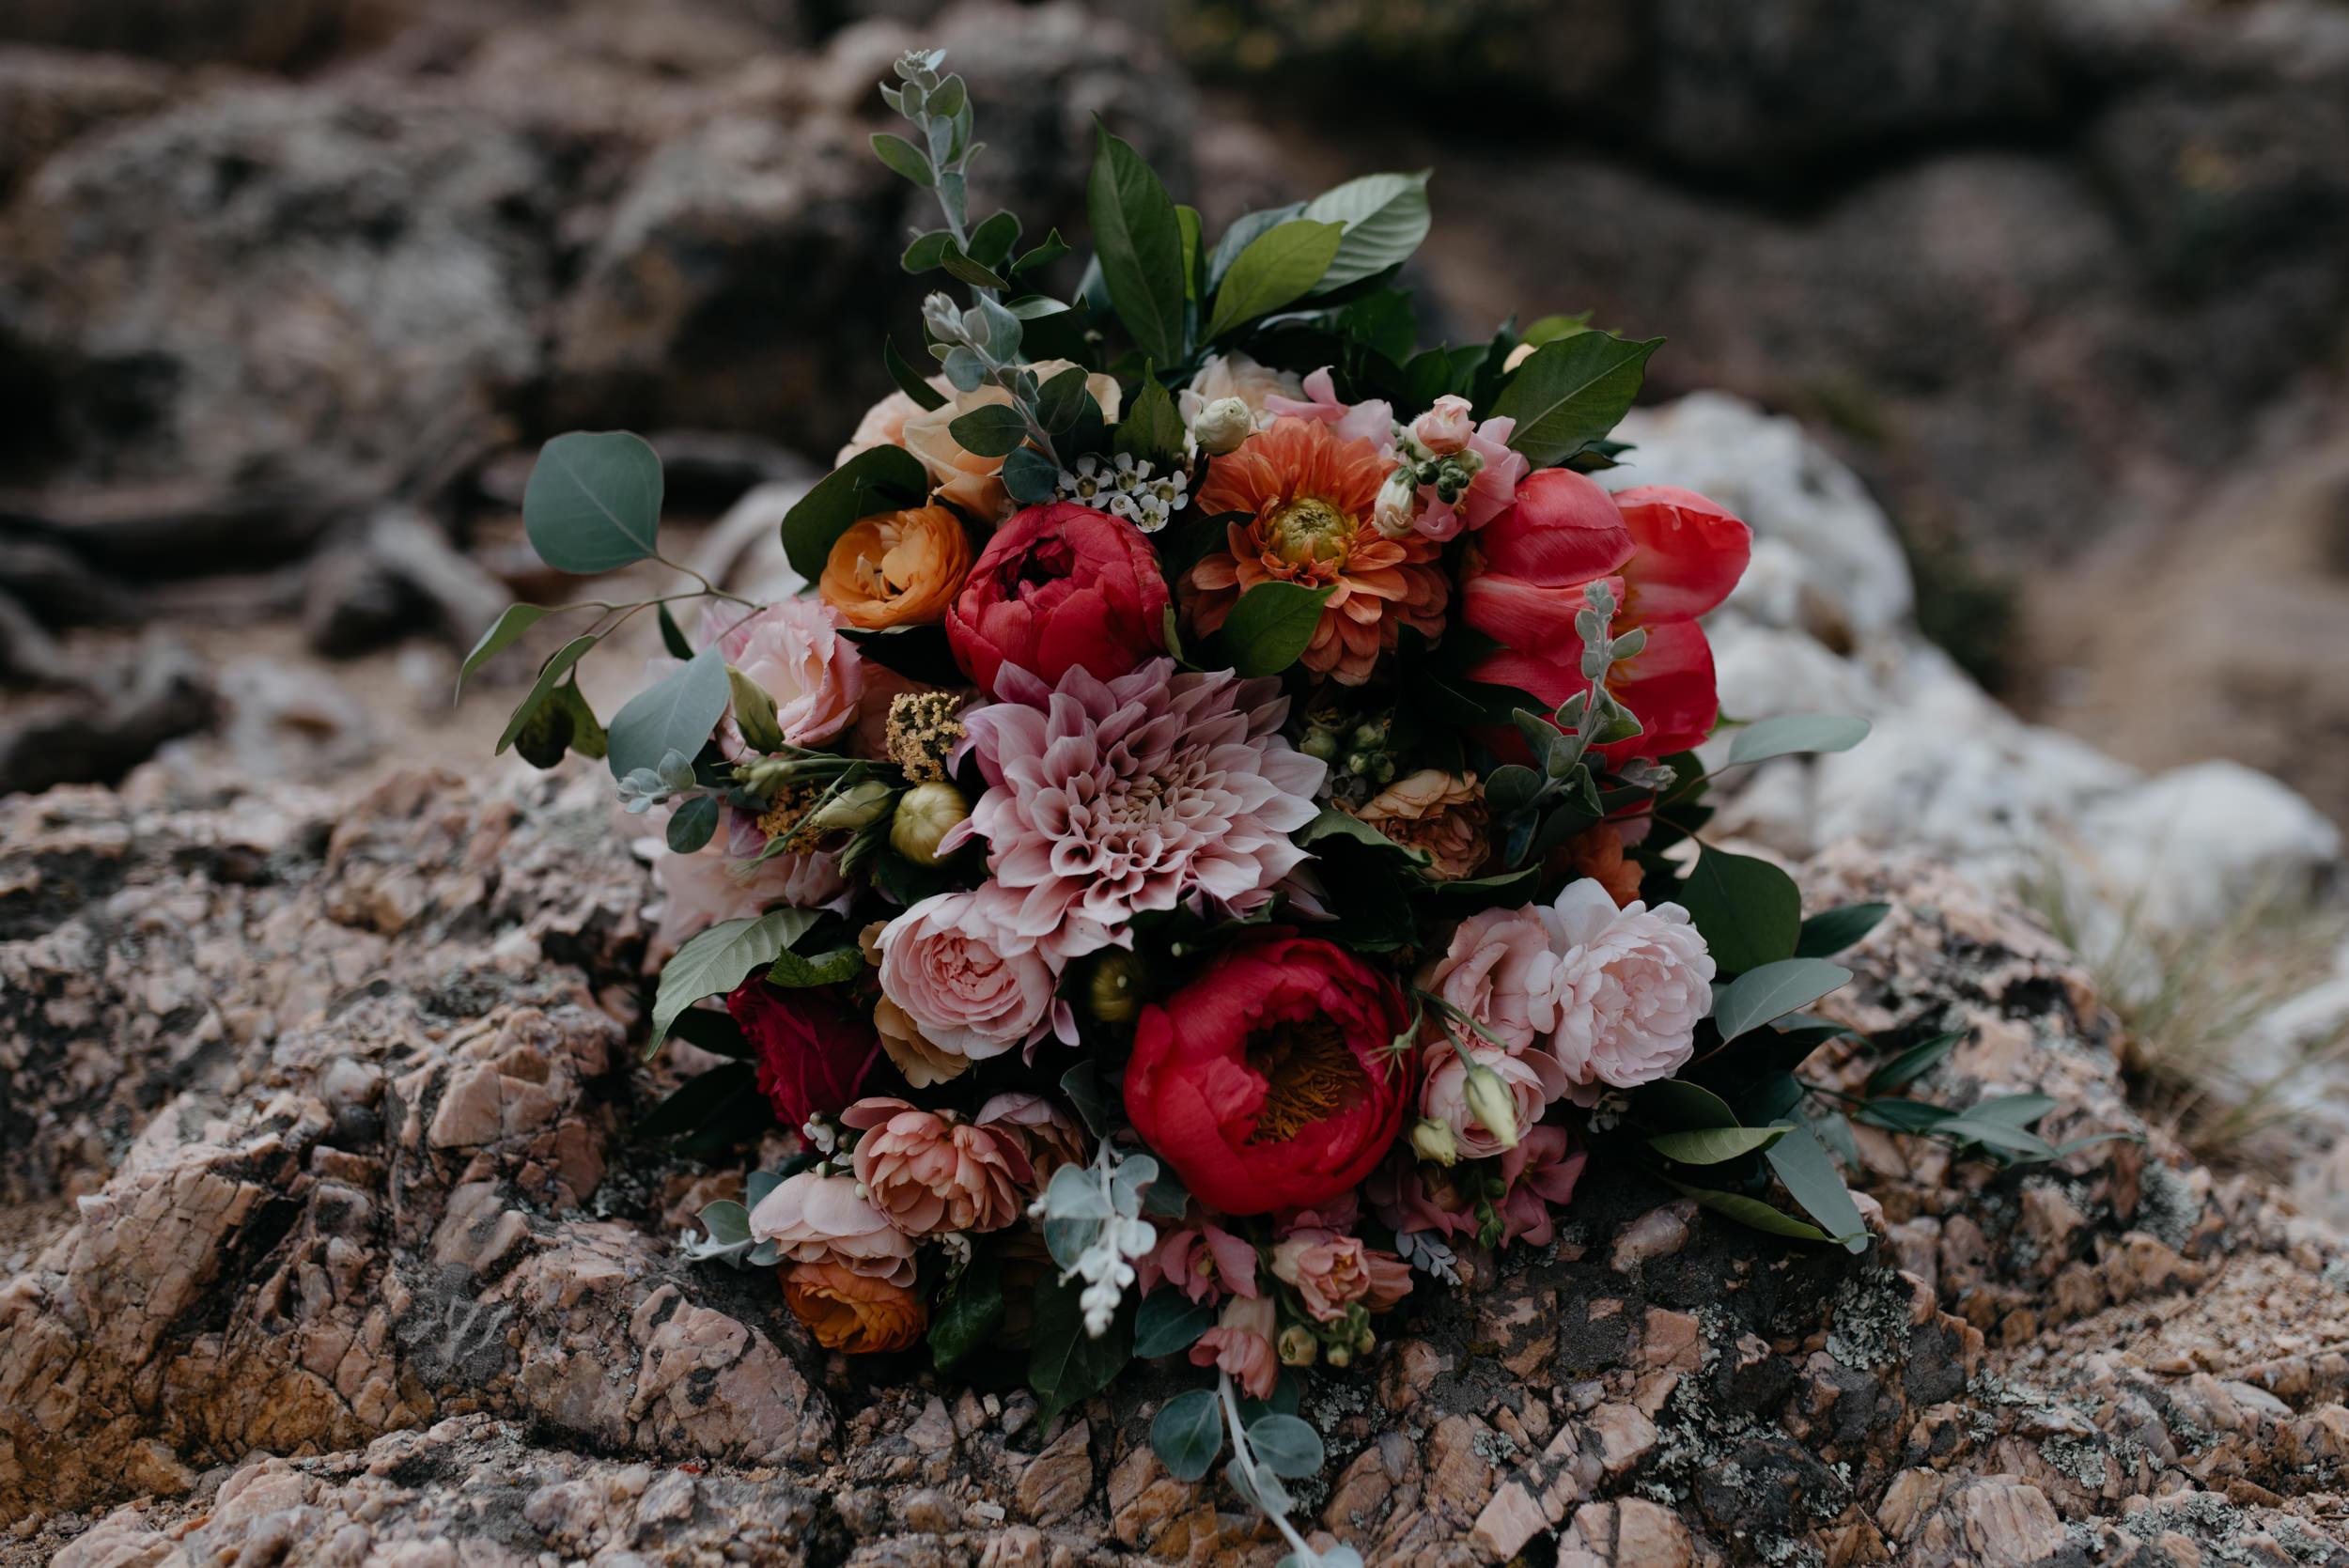 Florals, photos of bouquet. Lost Gulch elopement in Boulder. Colorado wedding and elopement photographer.